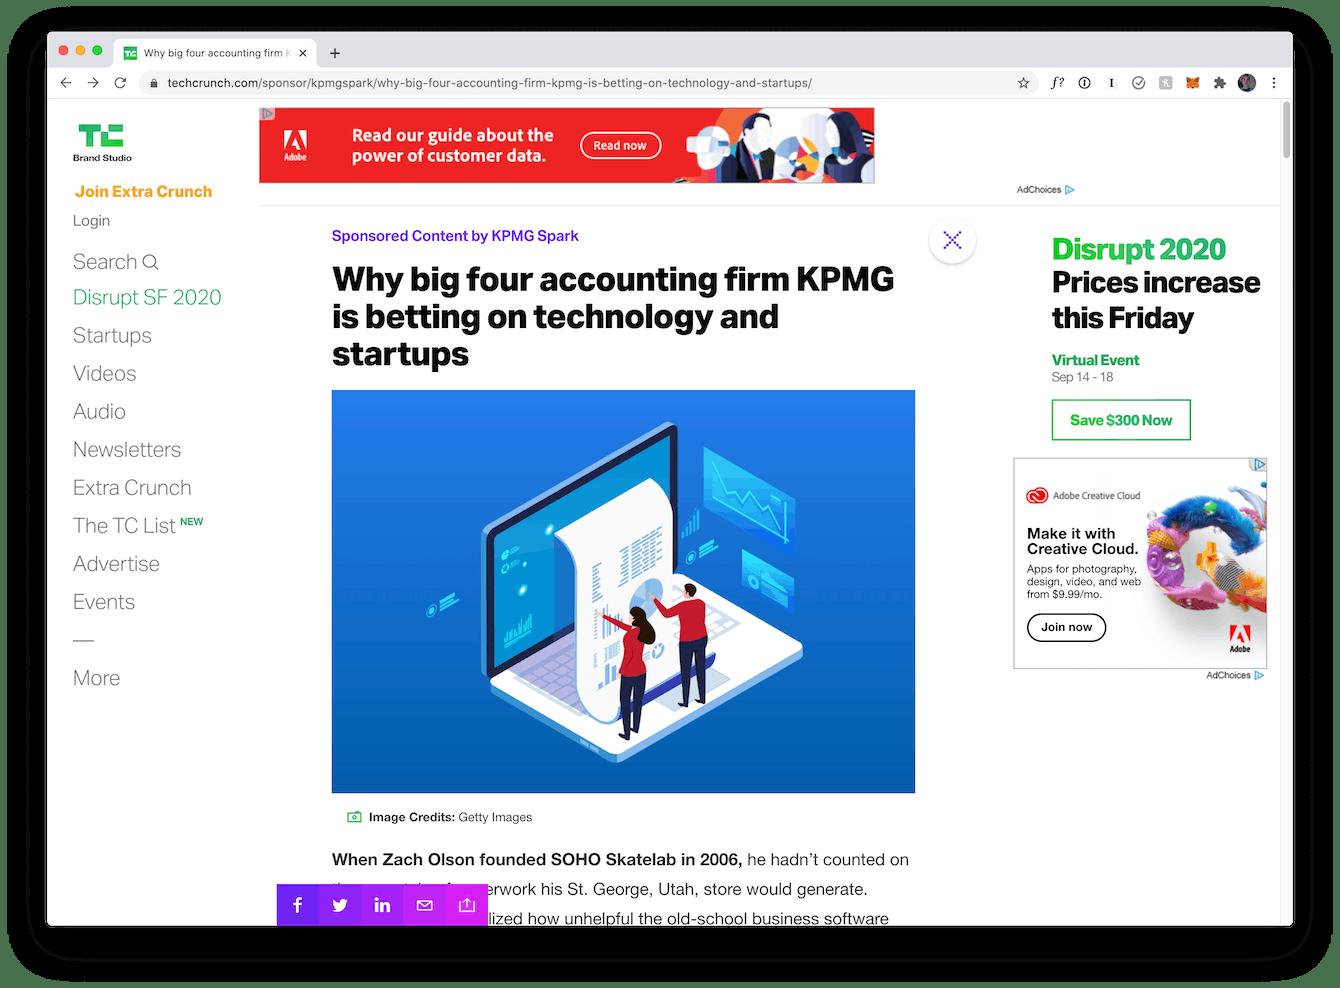 Screenshot of TechCrunch article about KPMG Spark